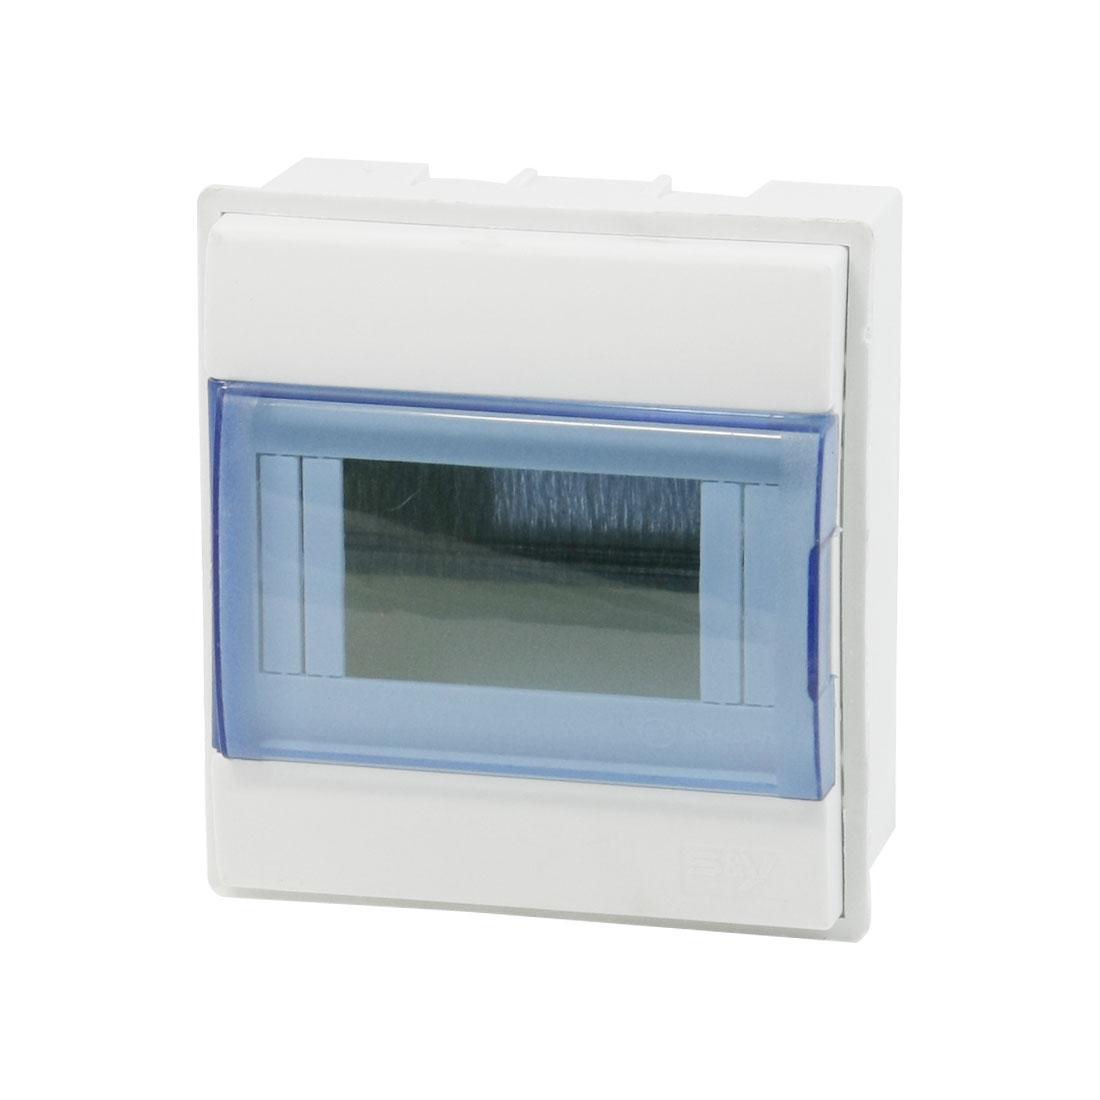 Clear Blue Flip Cap 4 Rectangular Way Power Distribution Box